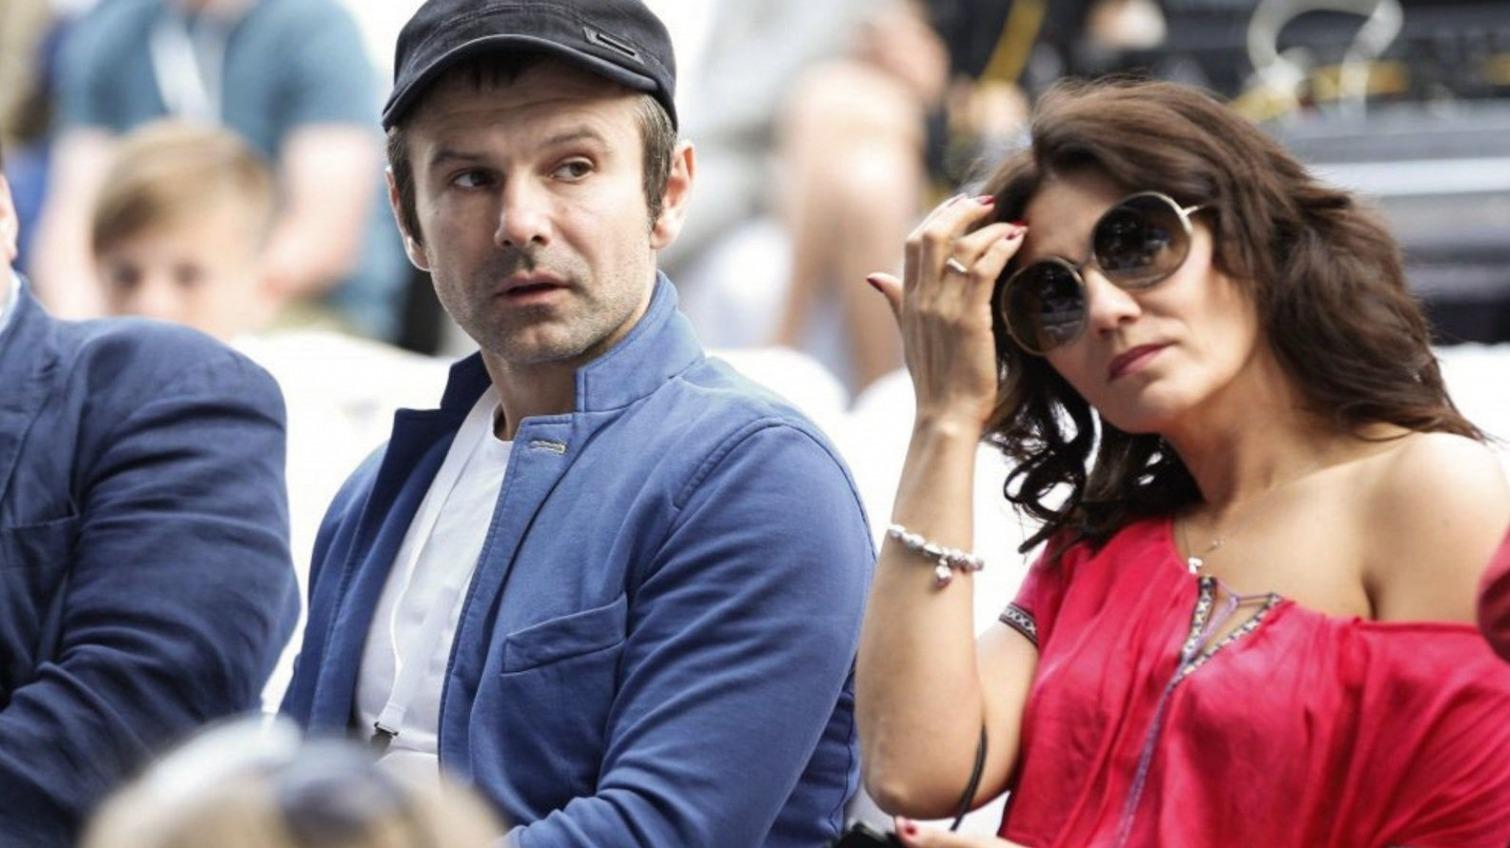 После 20 лет брака Вакарчук объявил о разводе с женой «фото»